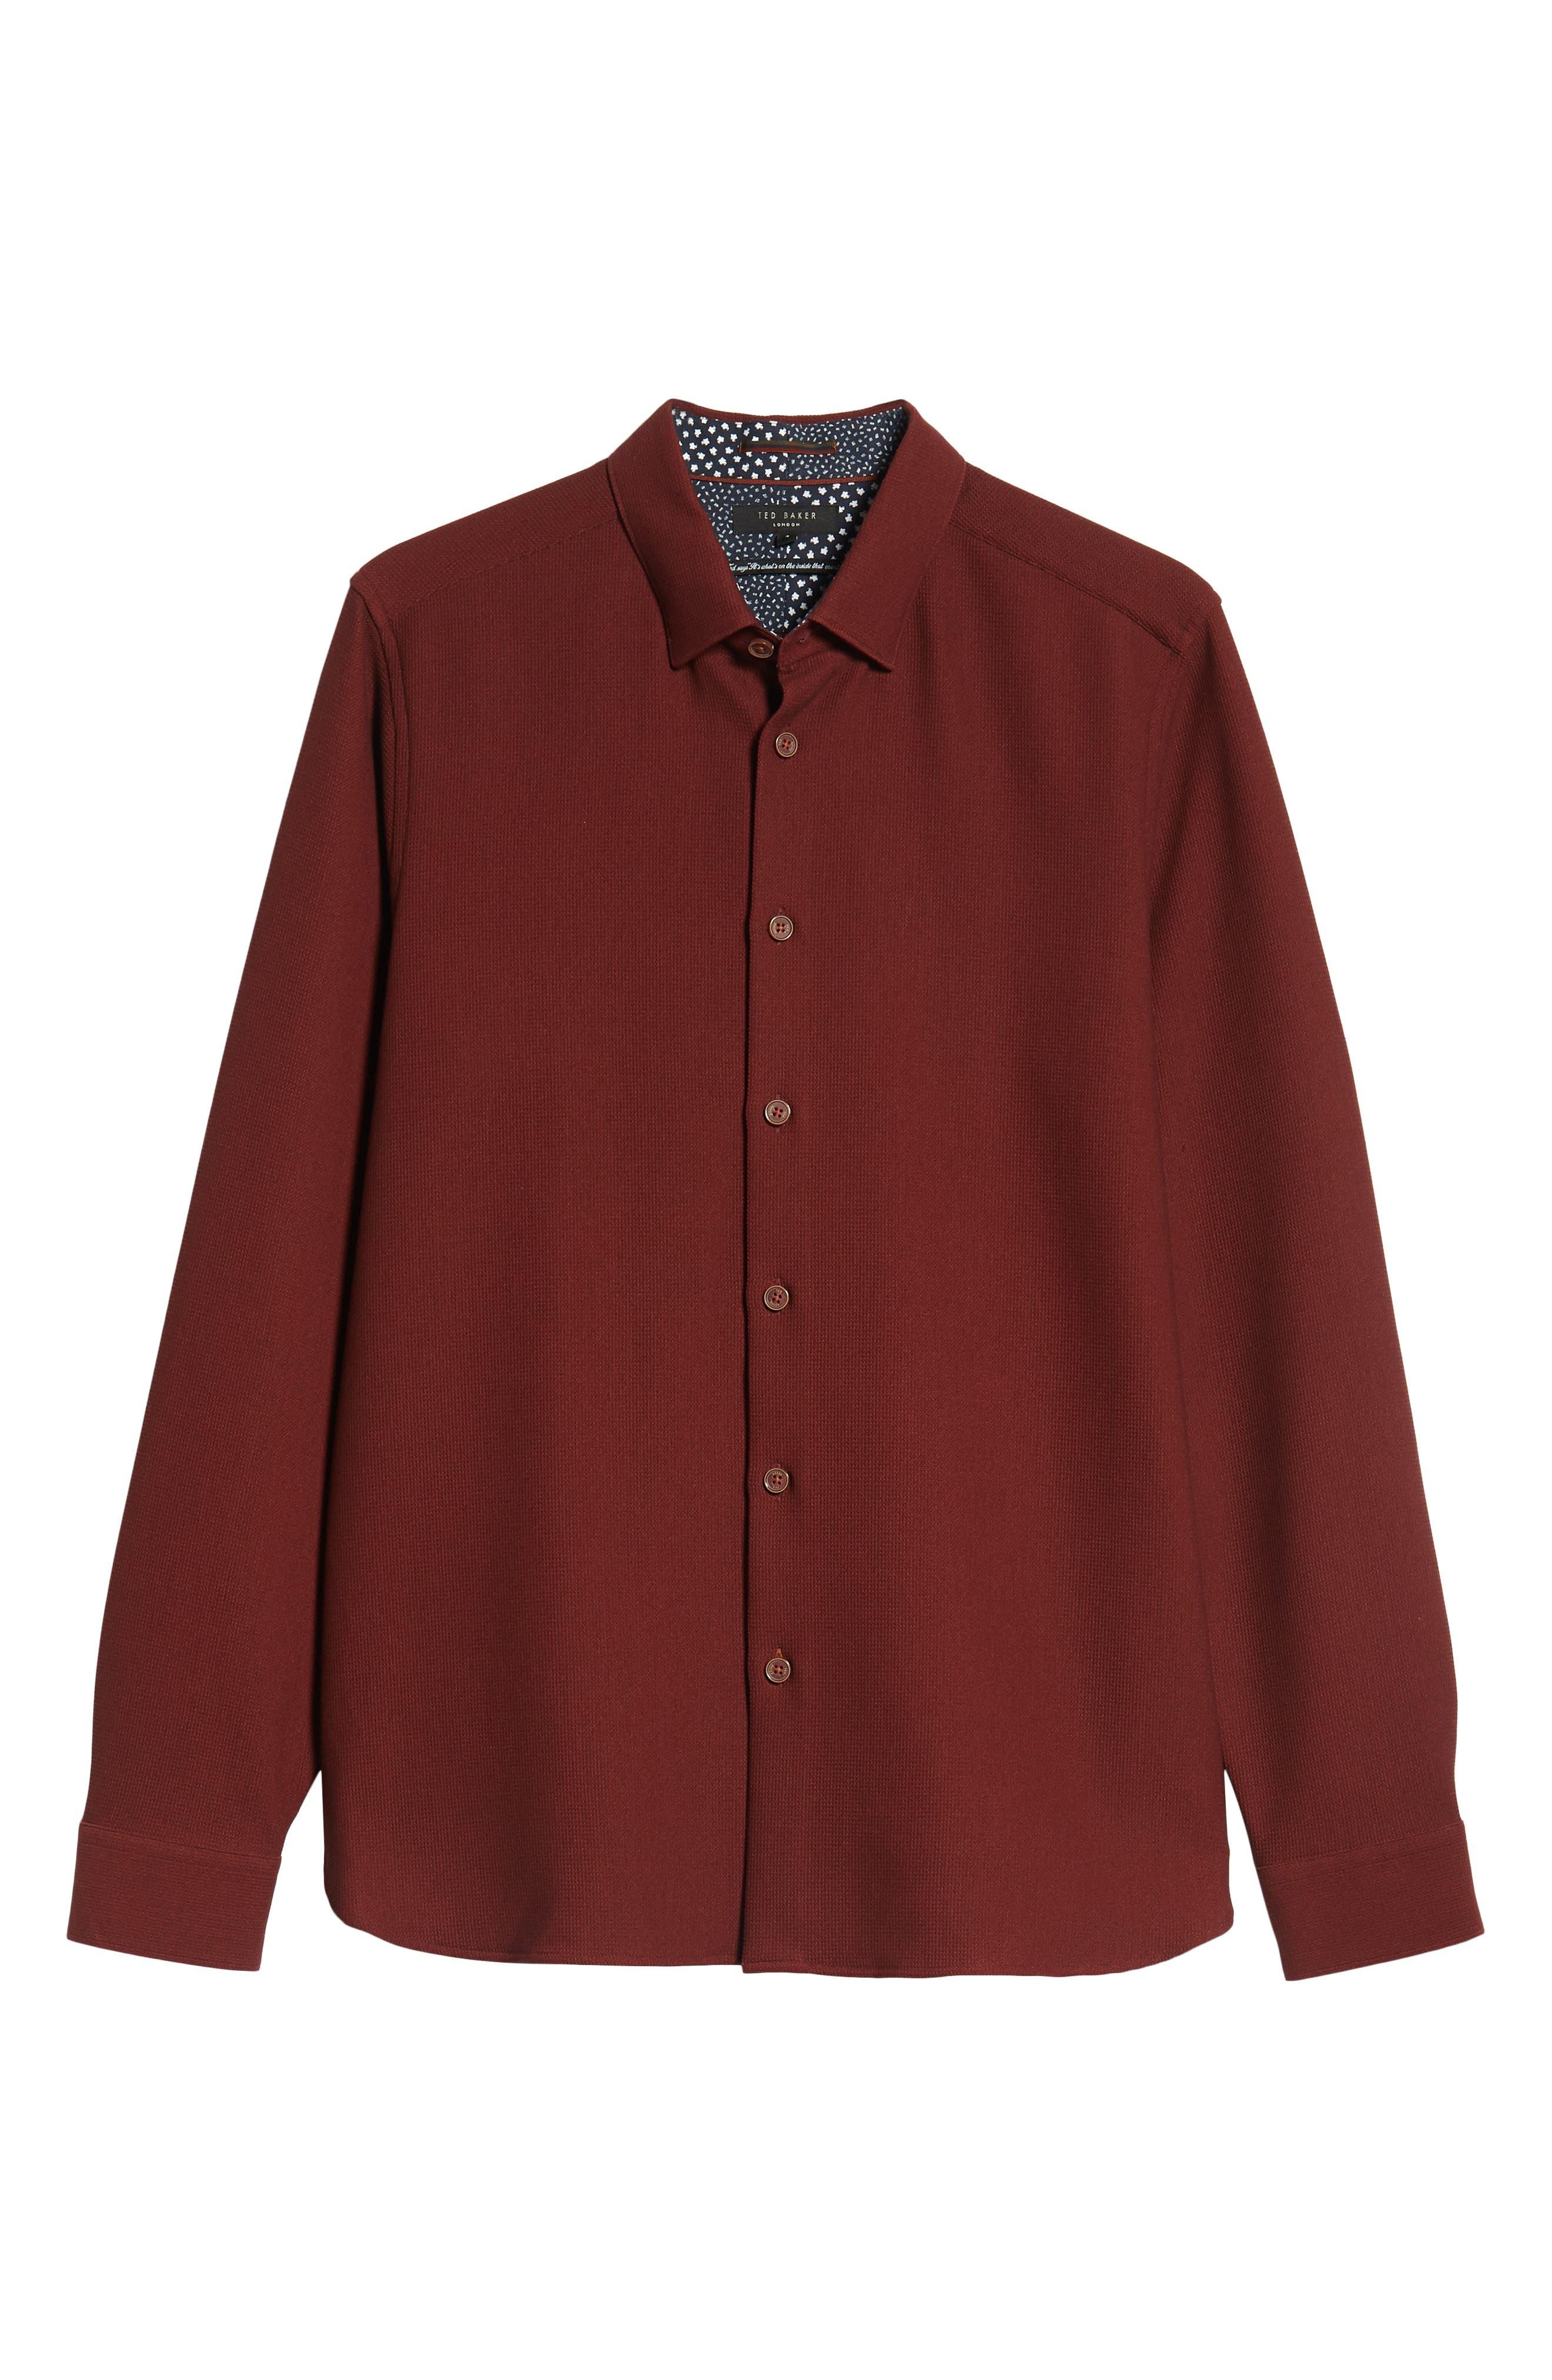 Piccatt Extra Slim Fit Stretch Solid Sport Shirt,                             Alternate thumbnail 5, color,                             DARK RED